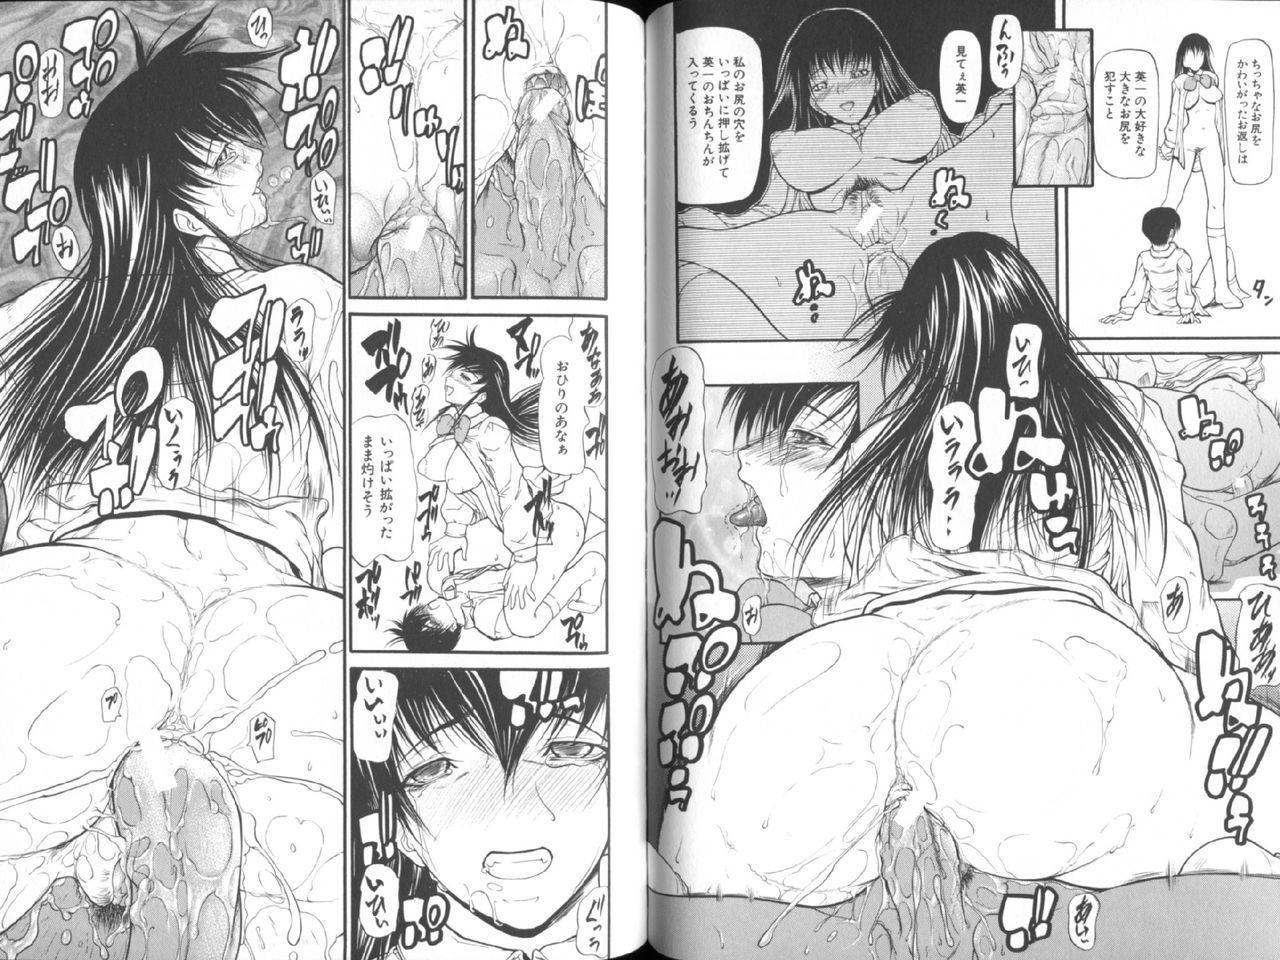 Senjou - A Desire is Instigated 89